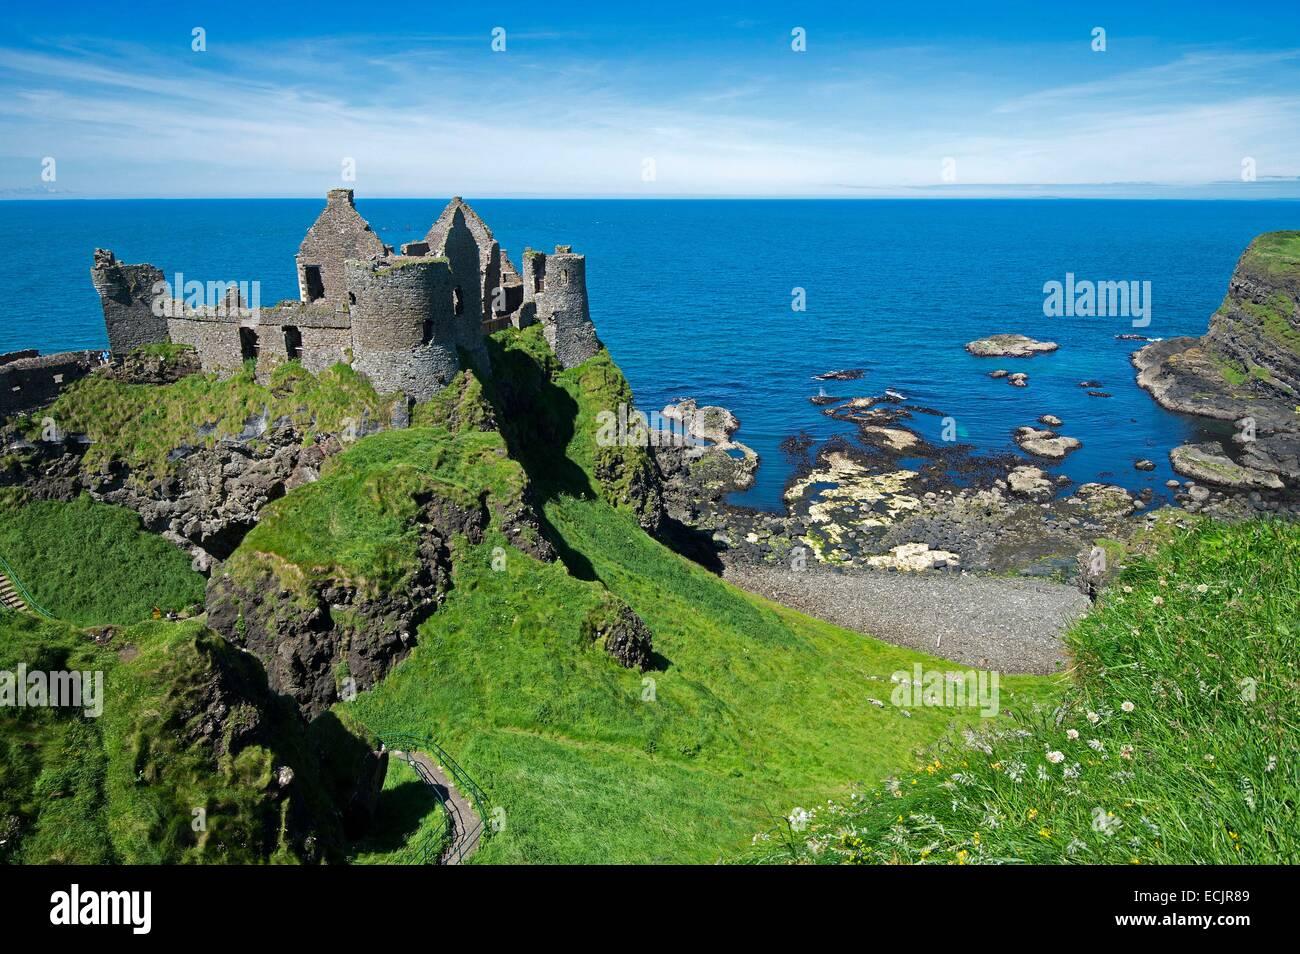 United Kingdom, Northern Ireland, County Antrim, Bushmills, the 14th century castle of Dunluce - Stock Image